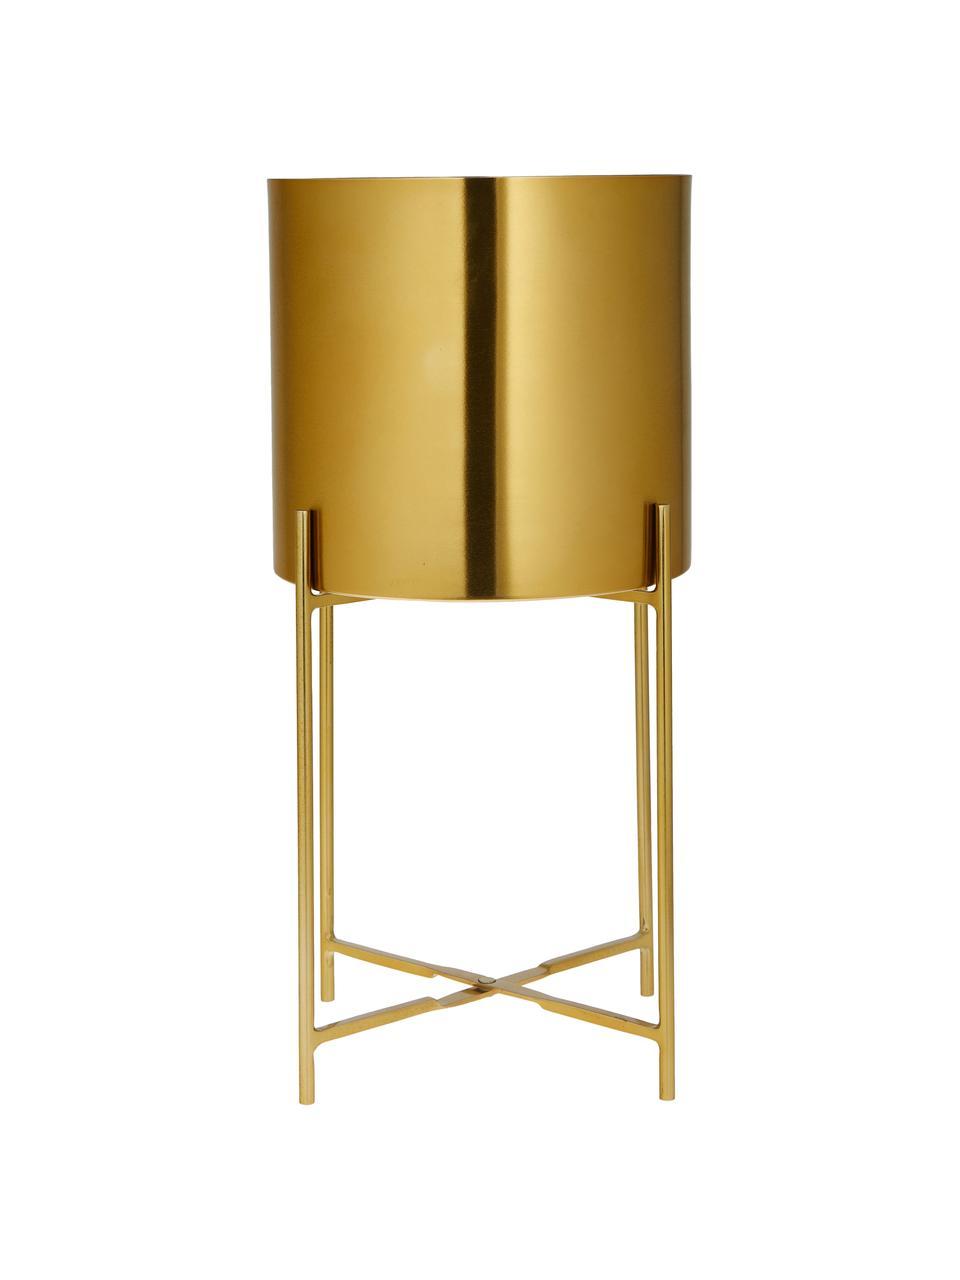 Set 2 portavasi alti in metallo Mina, Metallo verniciato a polvere, Oro, Set in varie misure